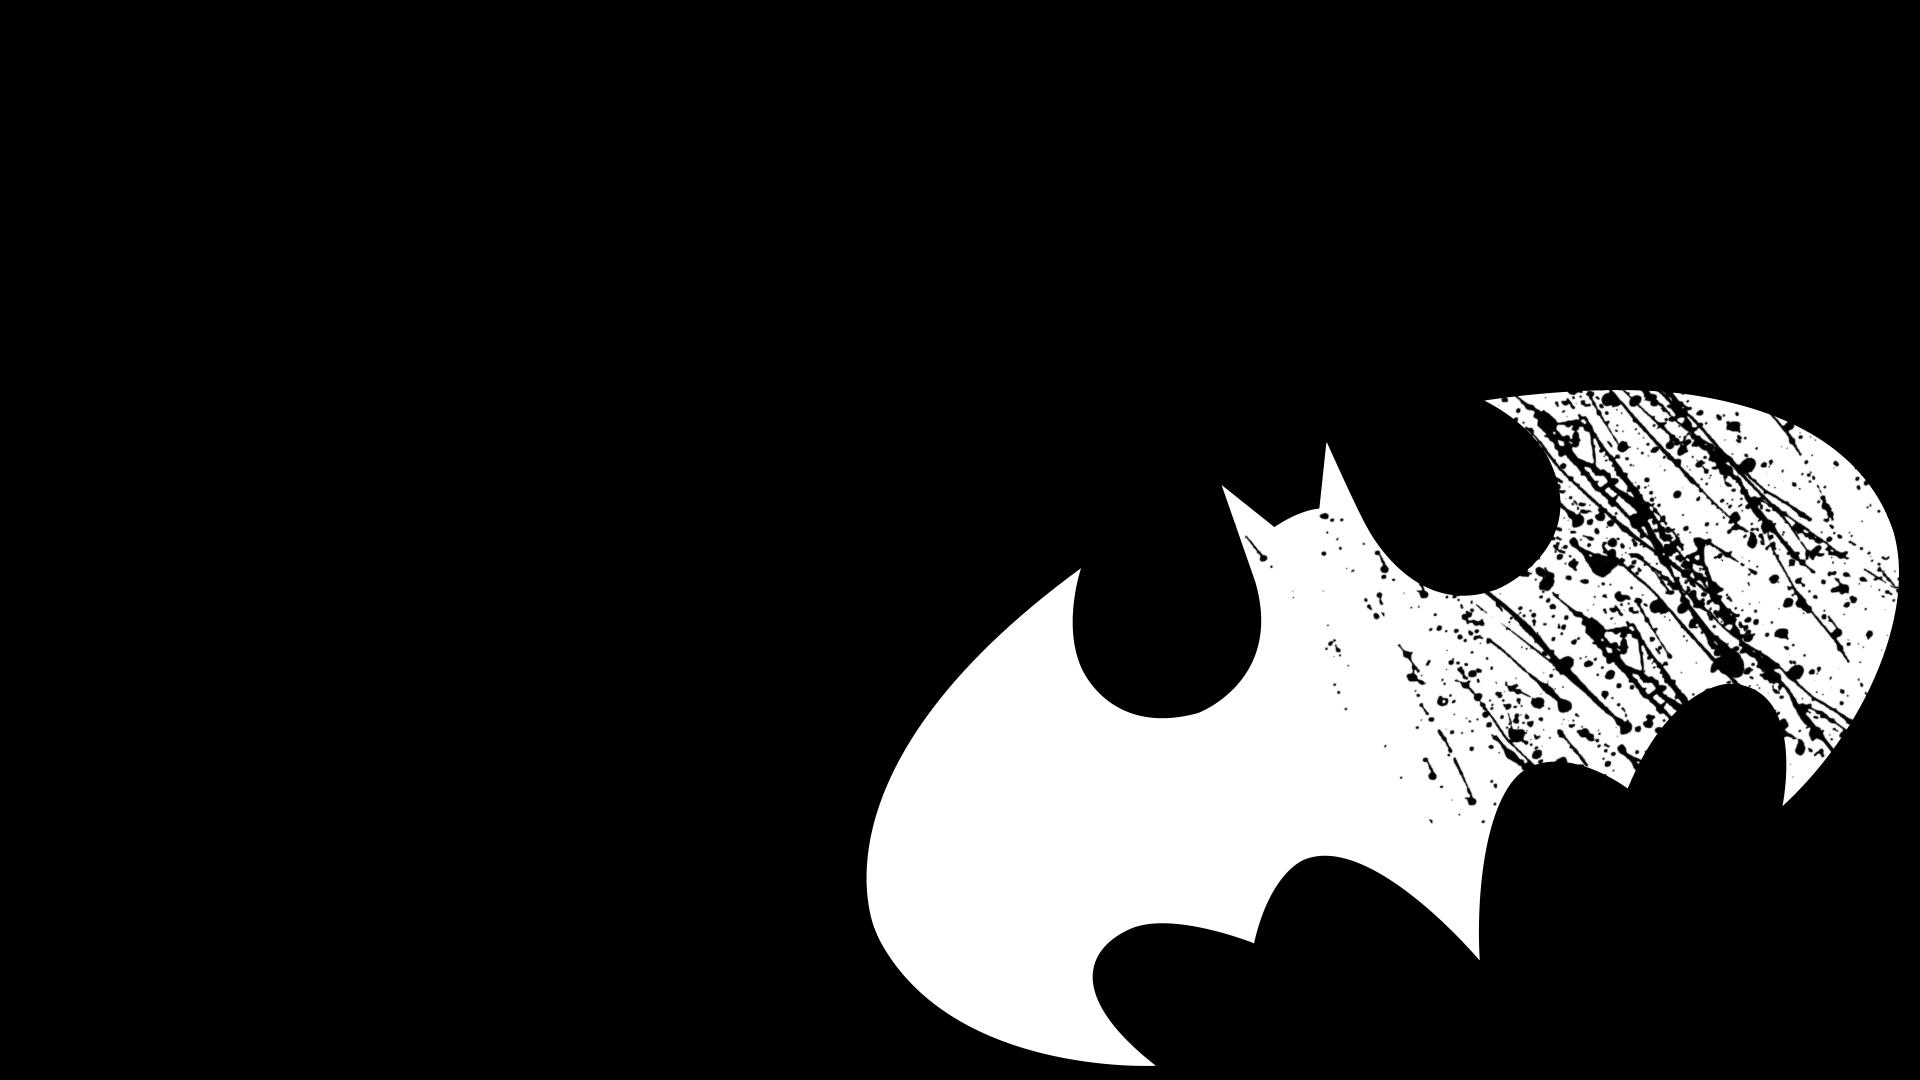 batman backgrounds new free download | pixelstalk